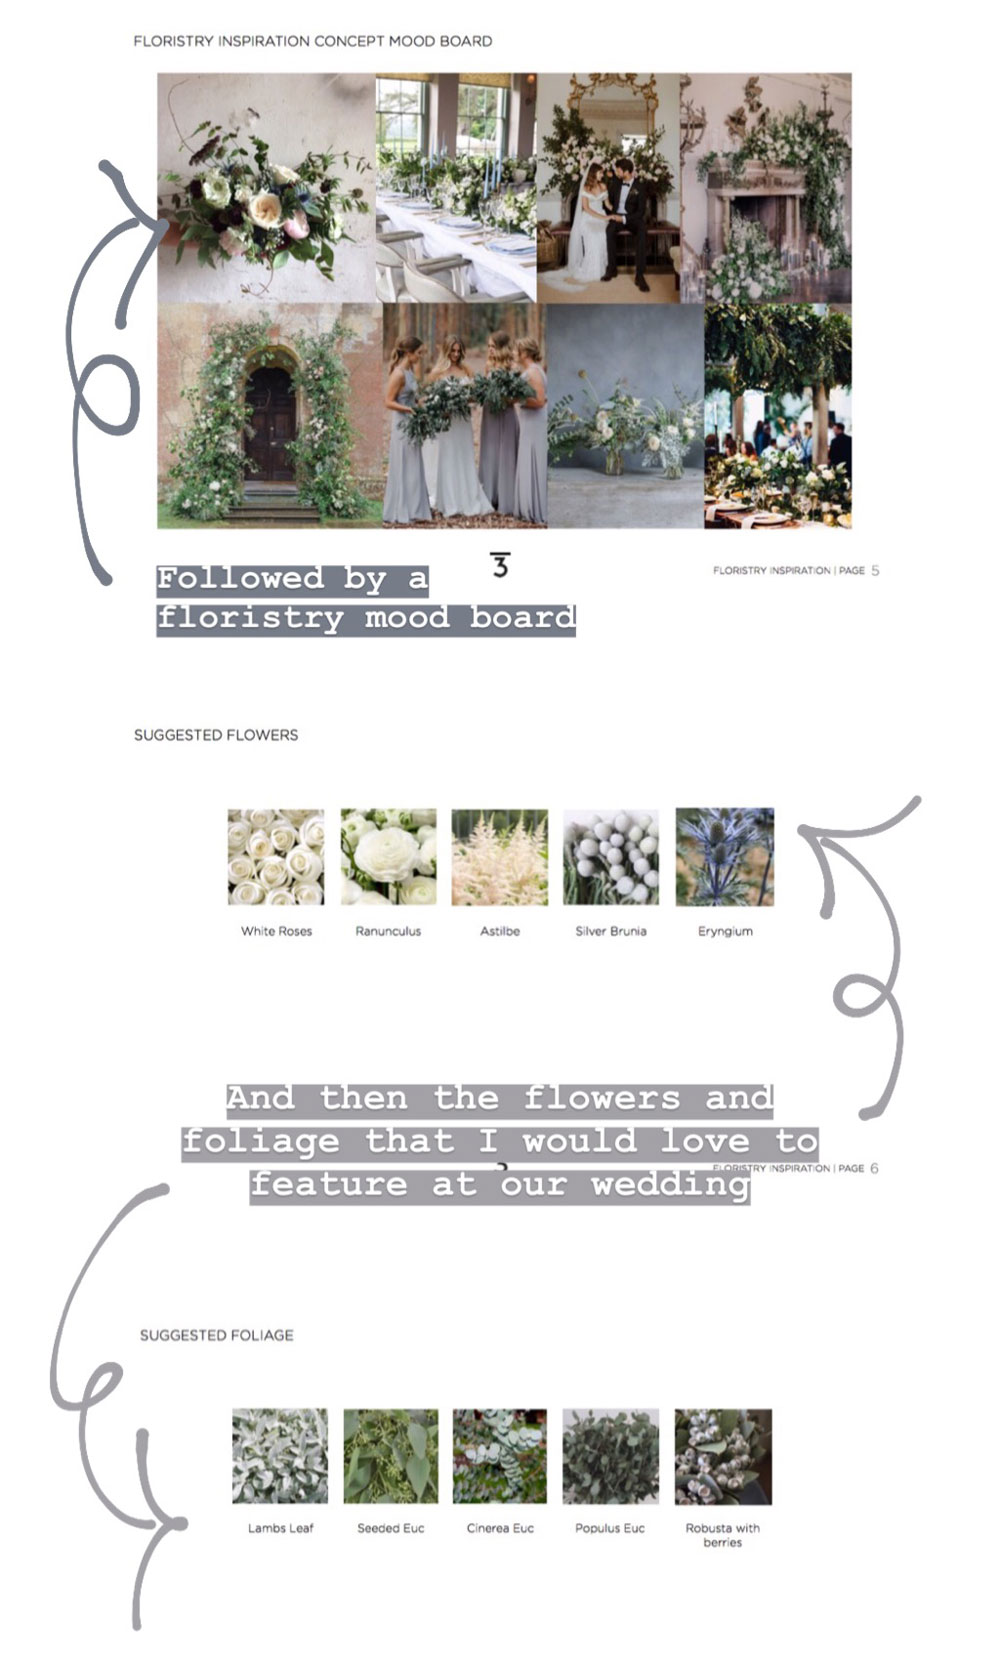 Wedding Flowers, Wedding Flower Inspiration, My Wedding, My Wedding Flowers, Floristry, Floristry Inspiration